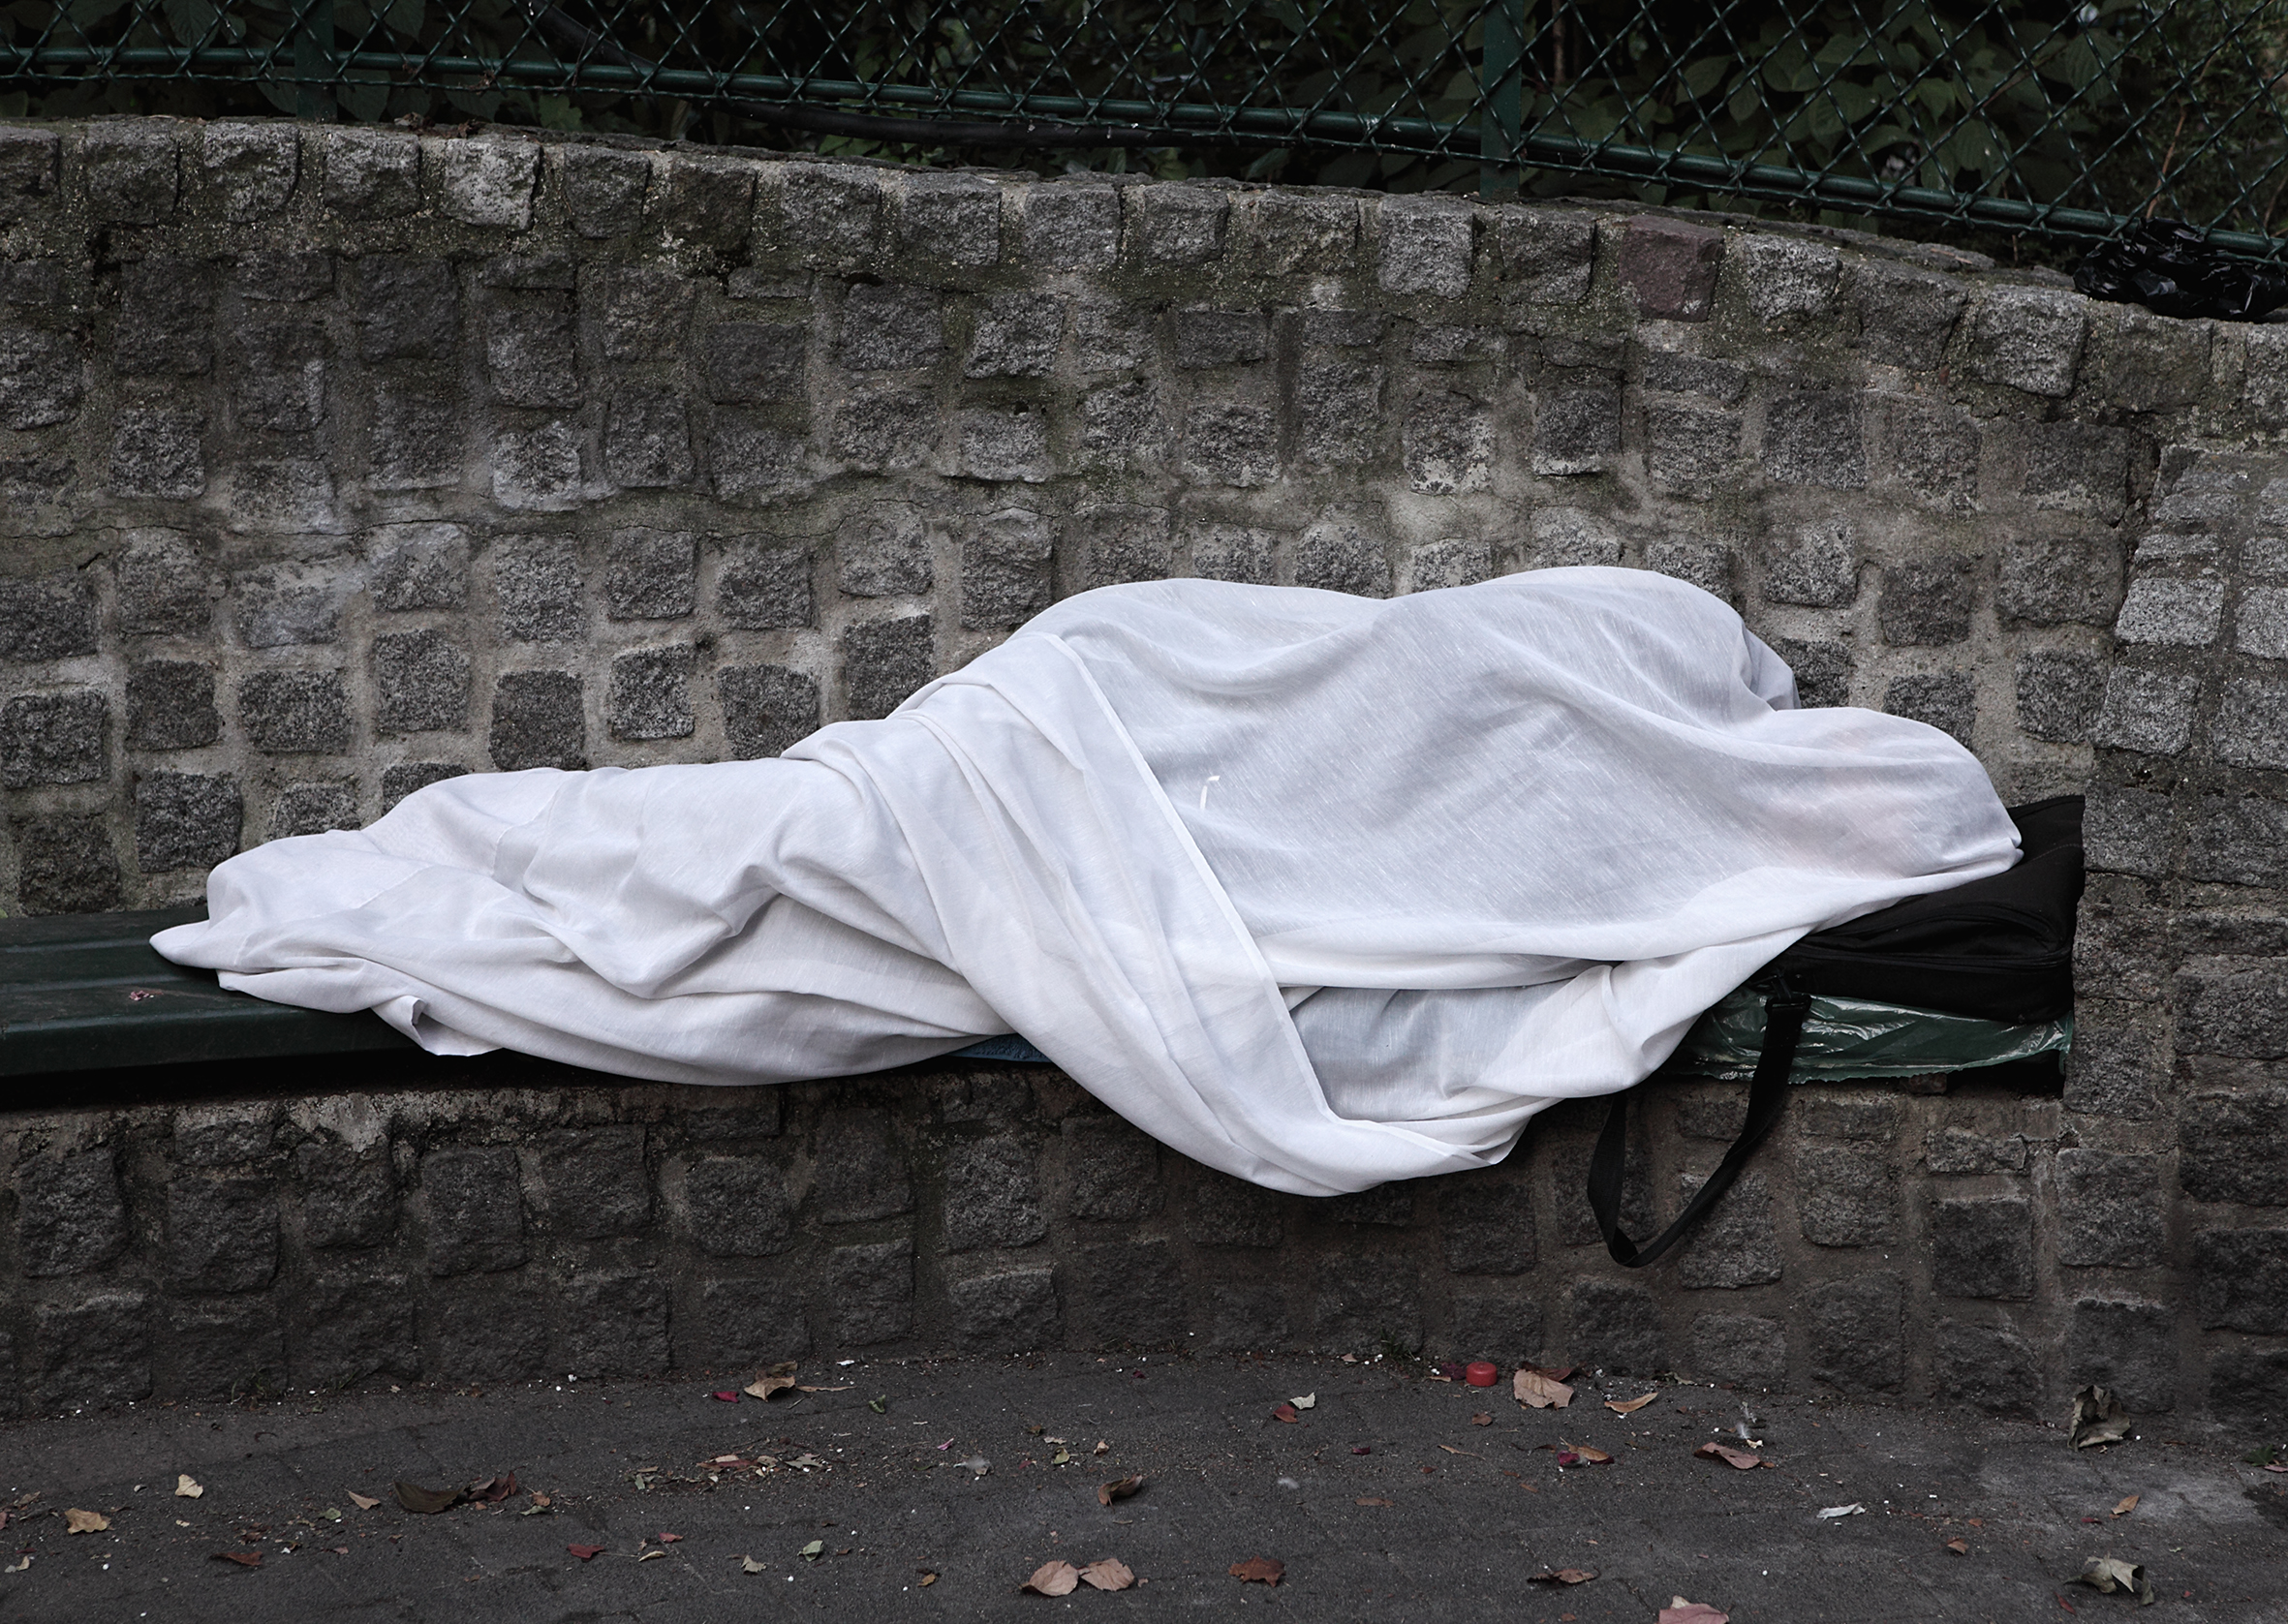 Les migrants, Paris, 2009 © Mathieu Pernot